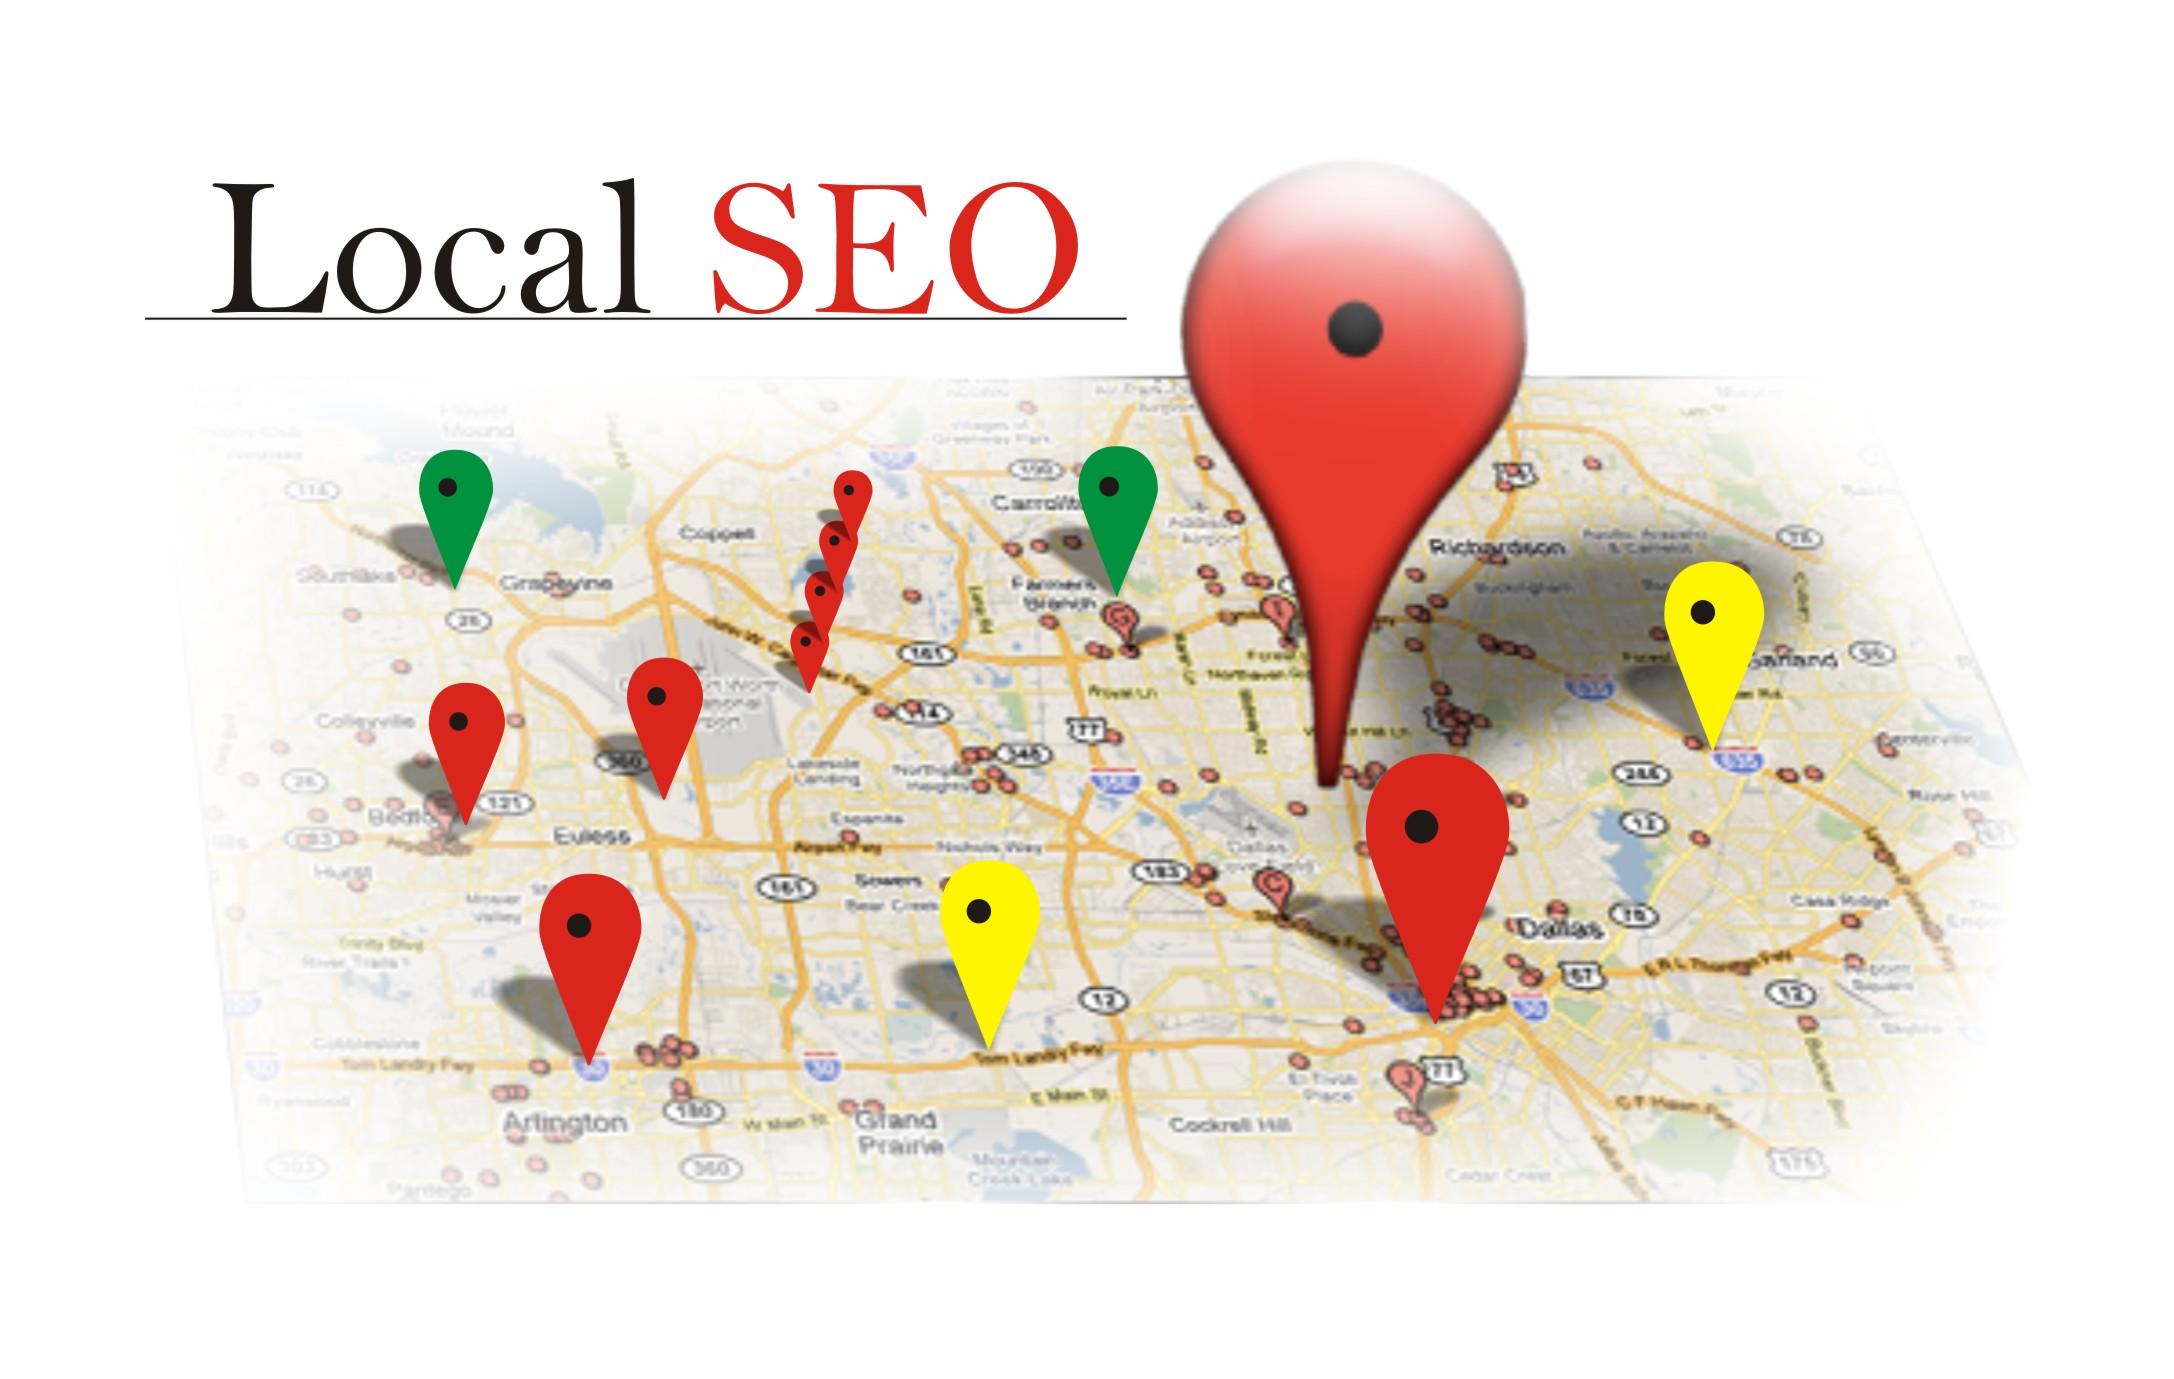 135 Google Map Citations For Local SEO